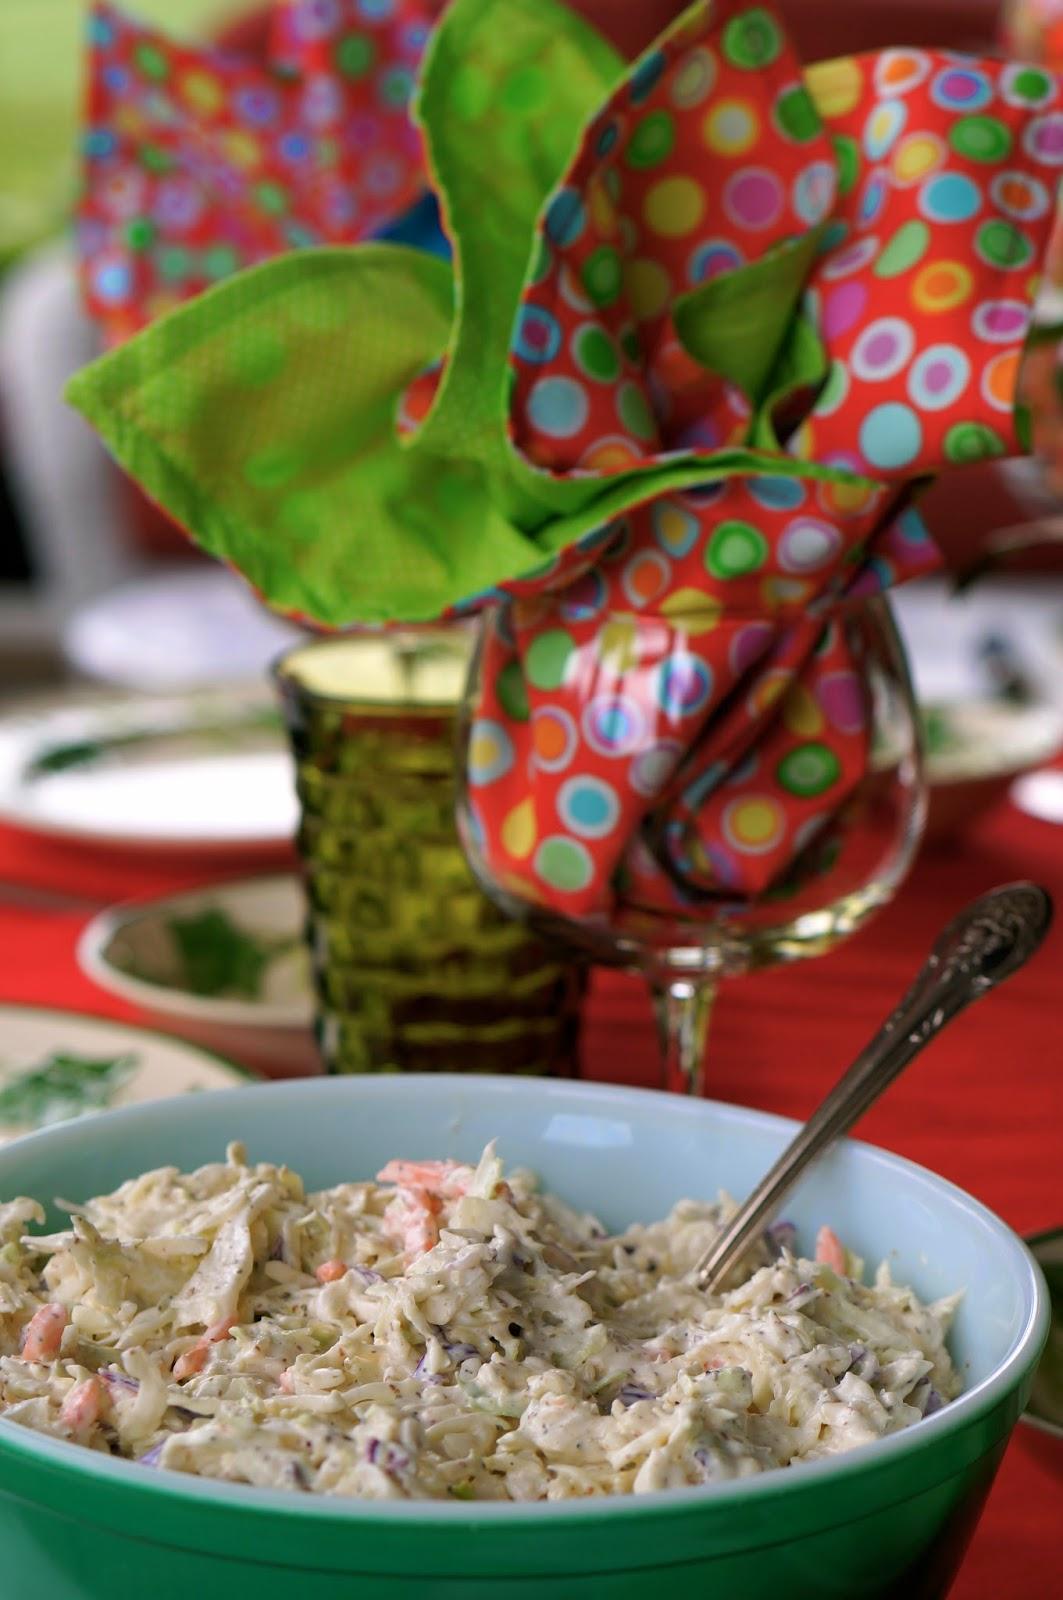 vegetable coleslaw, hellmann's mayonnaise, dijon mustard, sugar, dider vinegar, celery seeds, celery salt, kasher salt, pepper